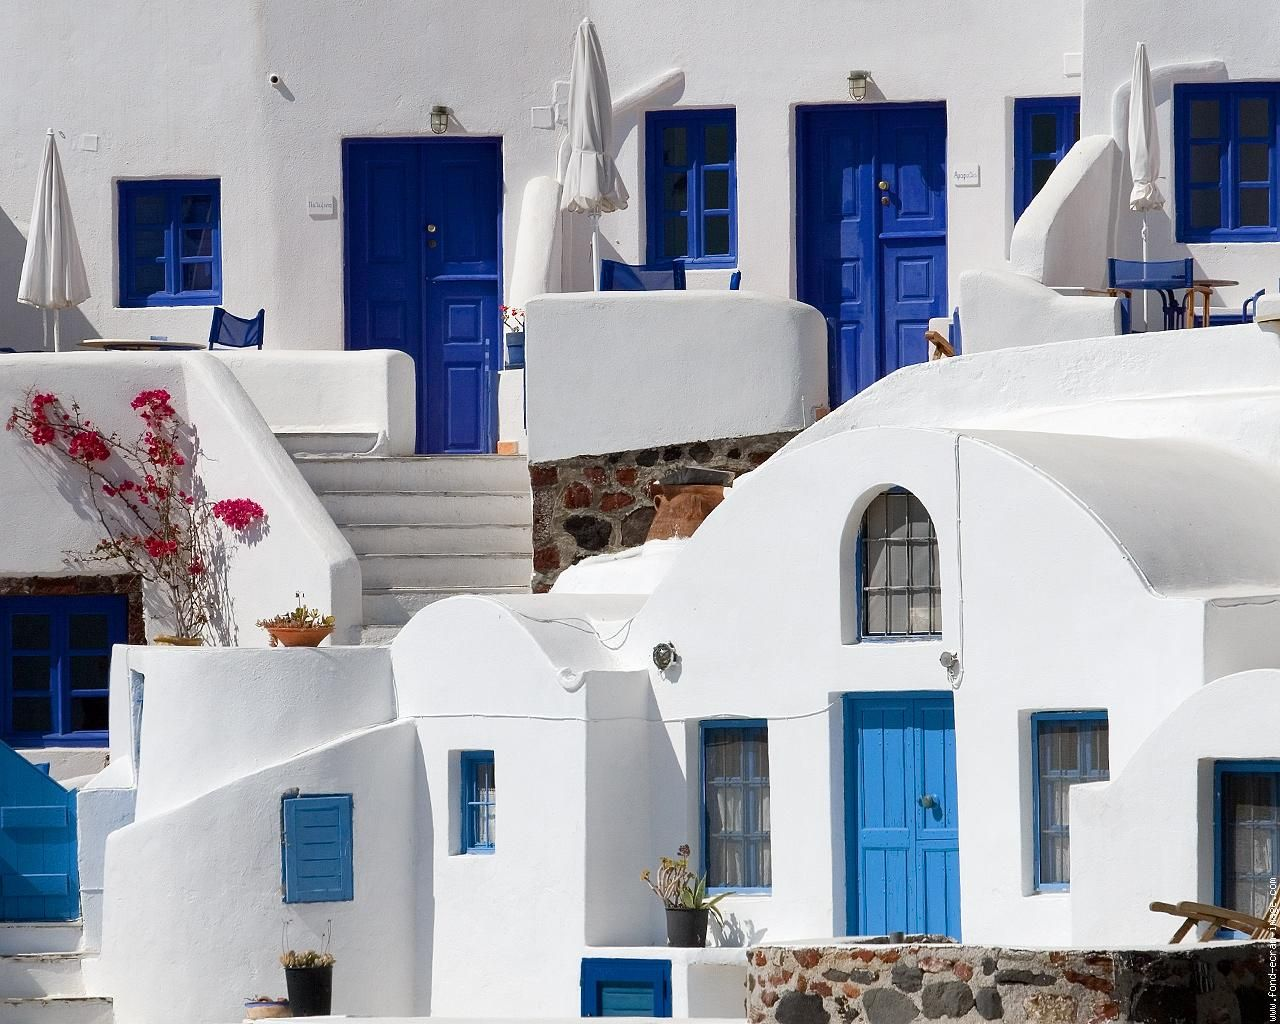 cyclades-santorin-maison-blanches-et-bleues